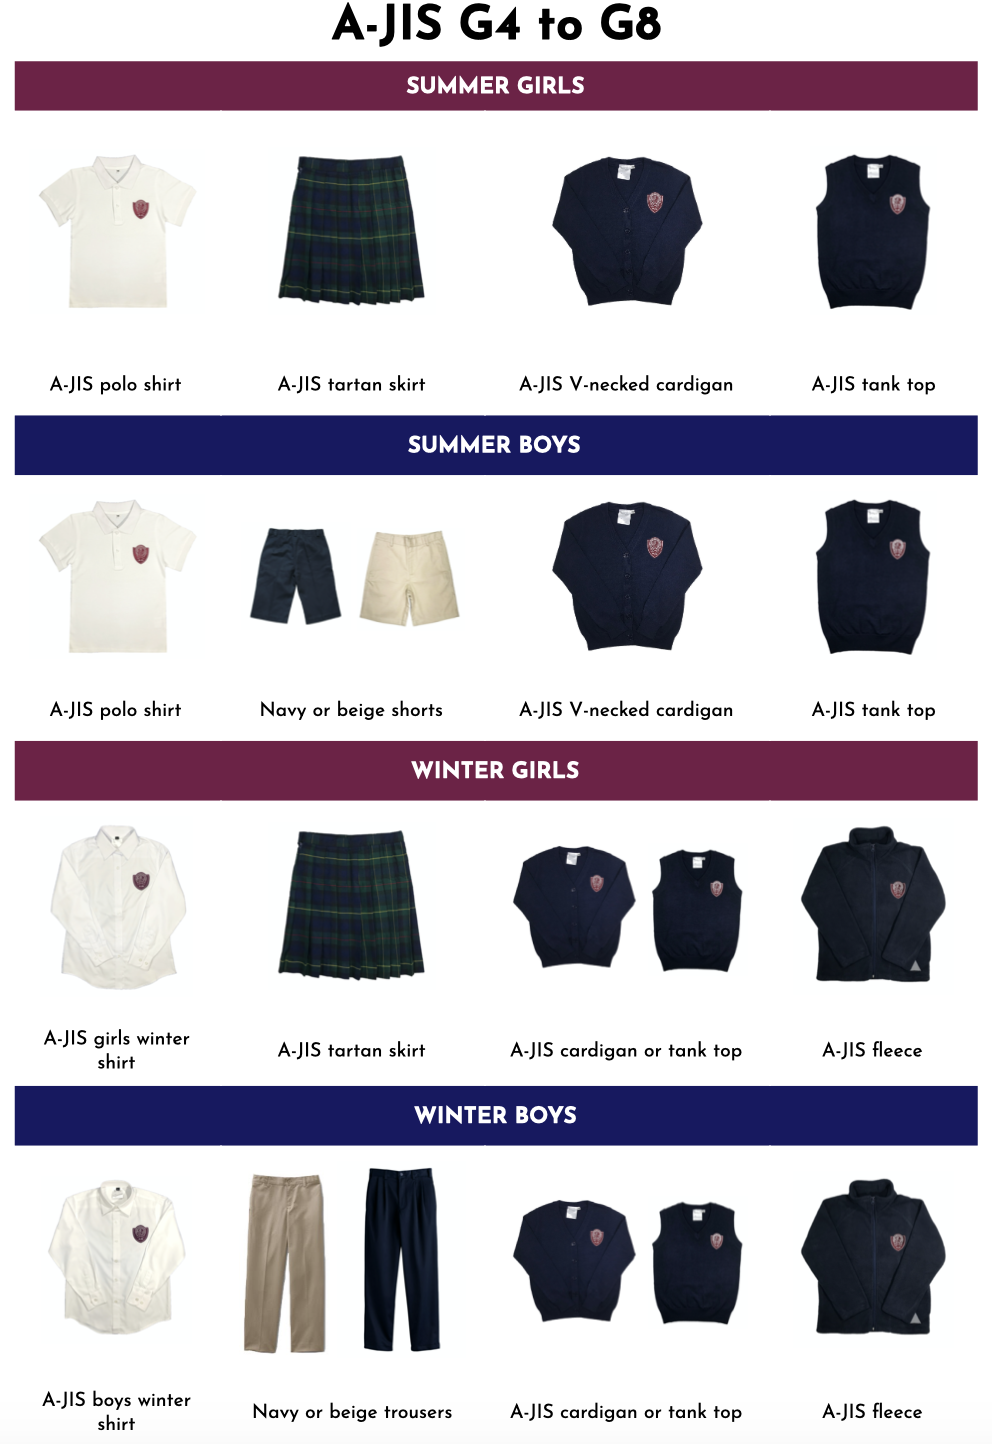 ajis-uniform-guide-2020-6.png